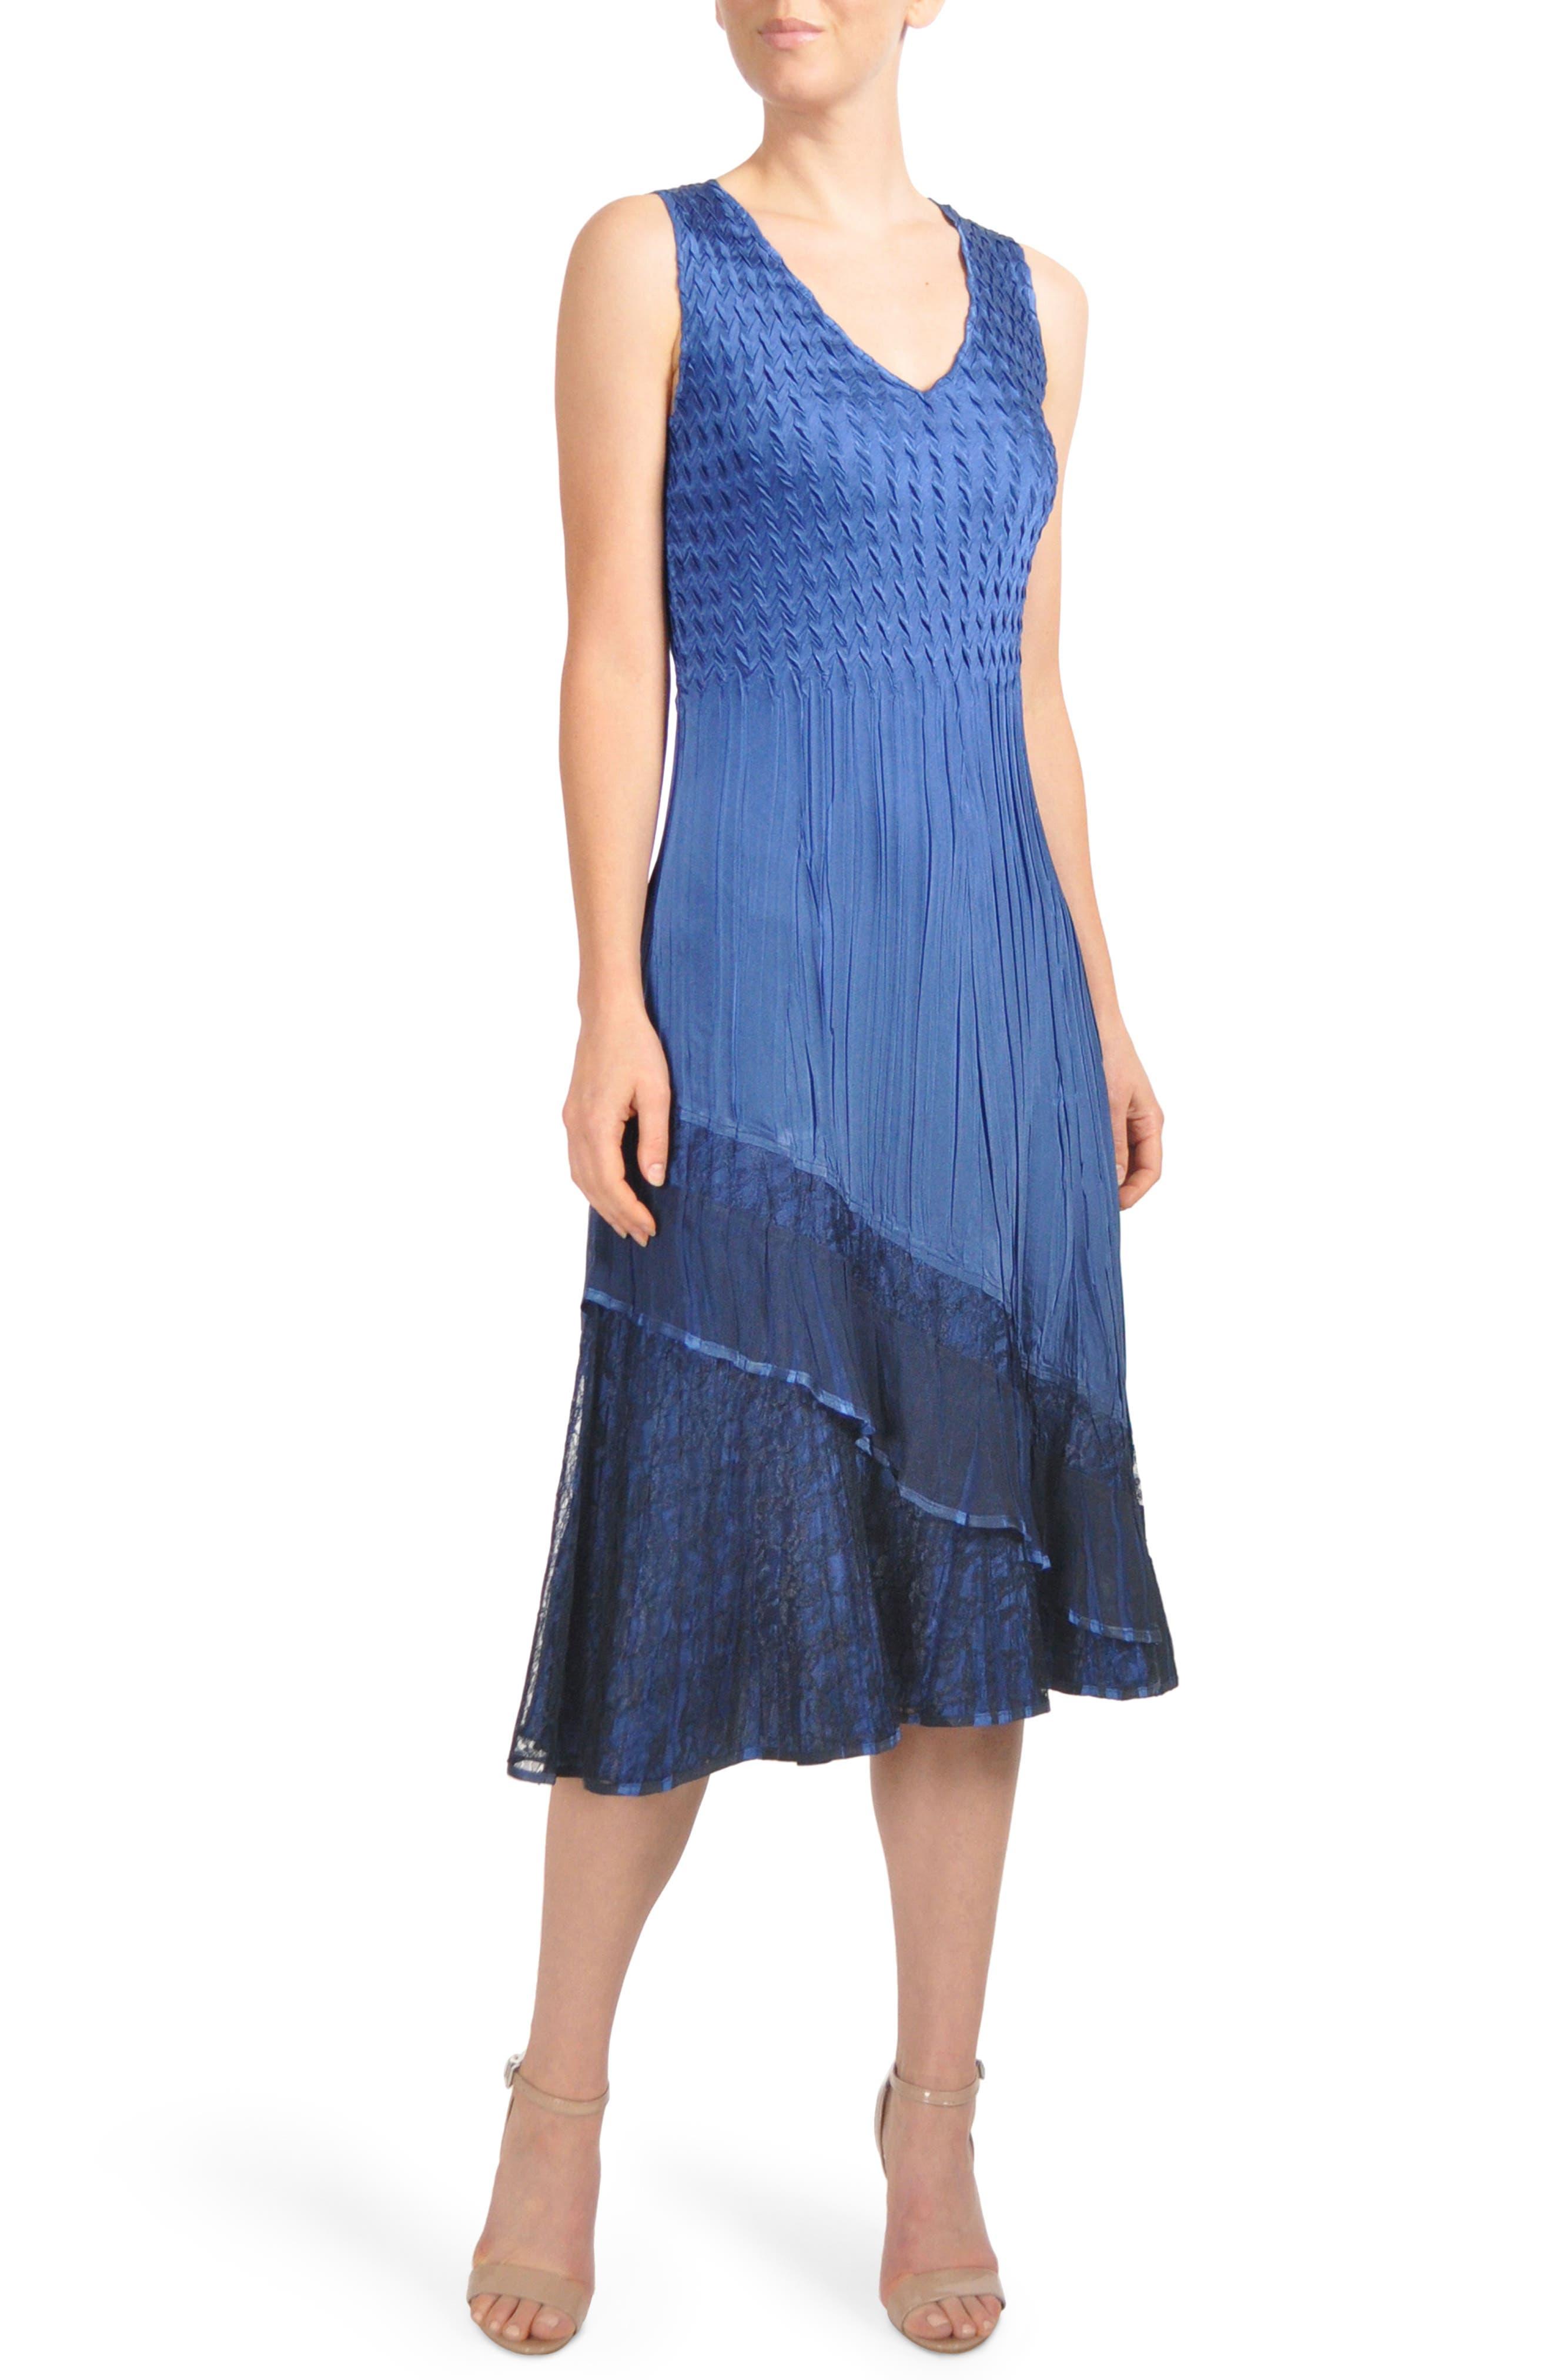 Komorov Midi Dress with Jacket,                             Alternate thumbnail 3, color,                             484